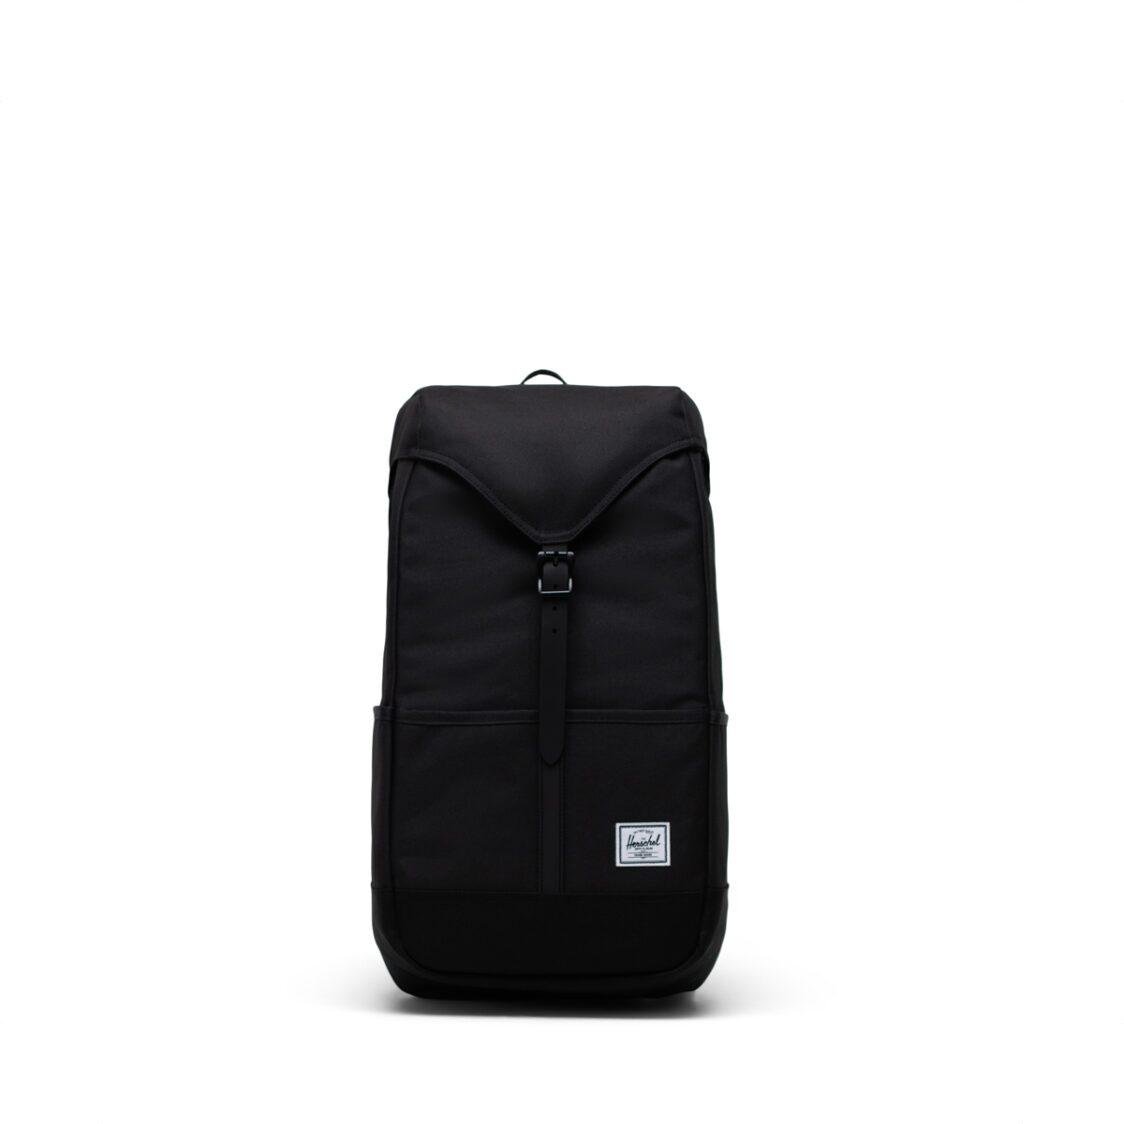 Herschel Thompson Pro Black Backpack 11041-00001-OS